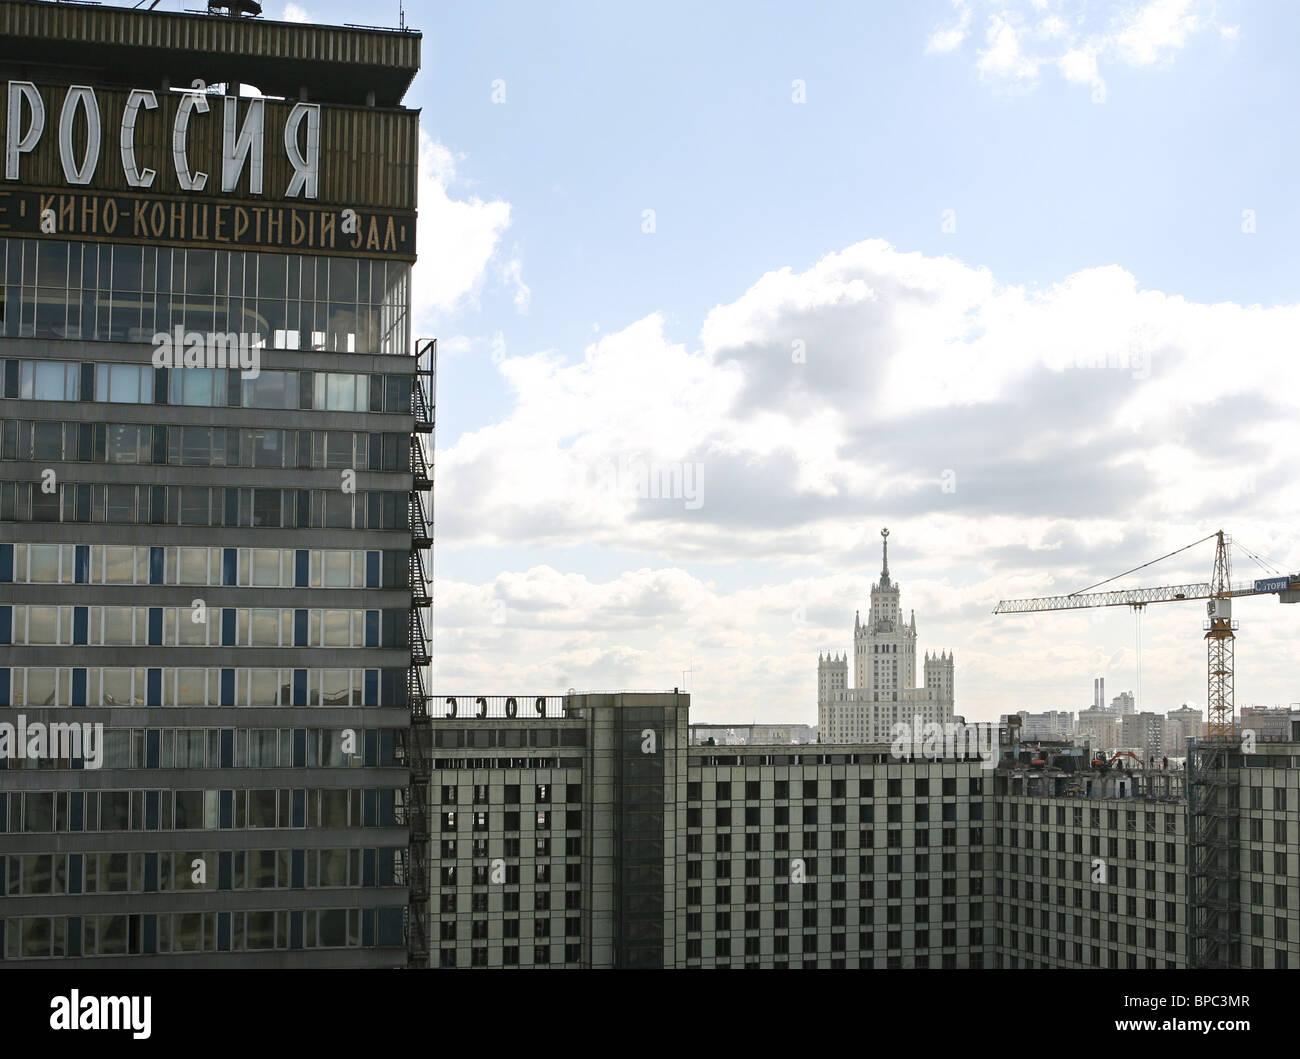 Rossiya Hotel being demolished Stock Photo